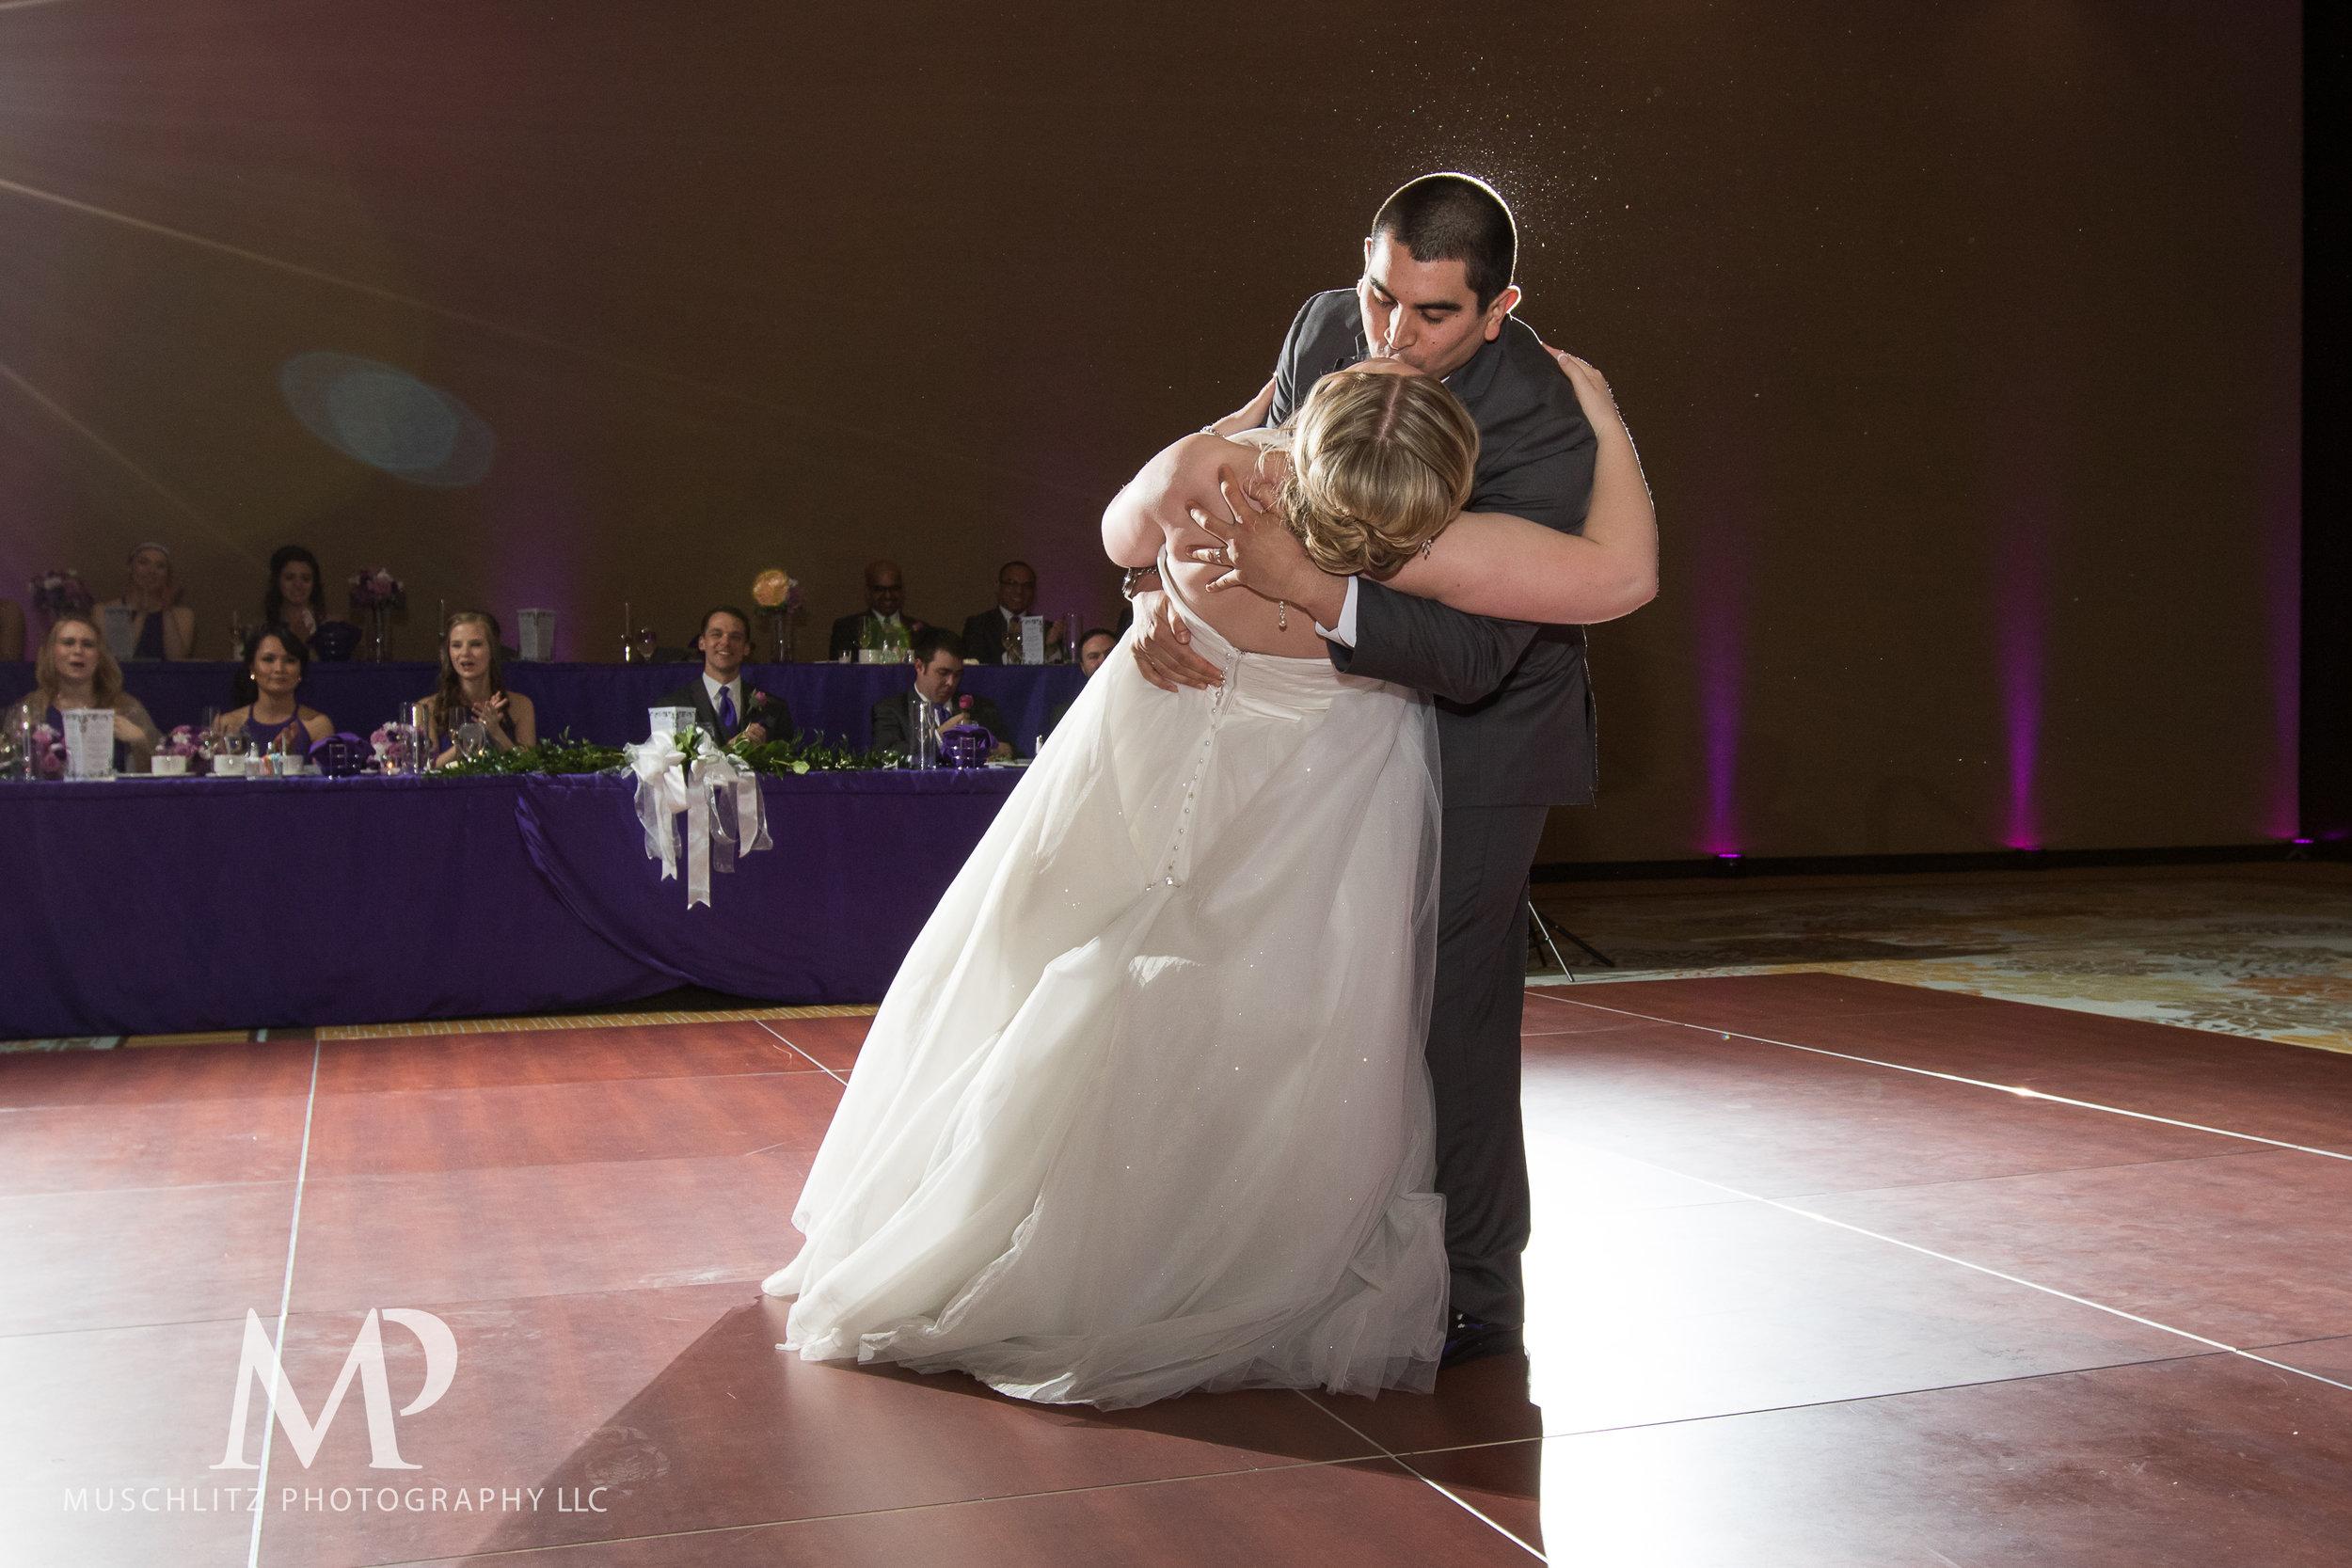 hilton-polaris-wedding-columbus-ohio-muschlitz-photography-023.JPG